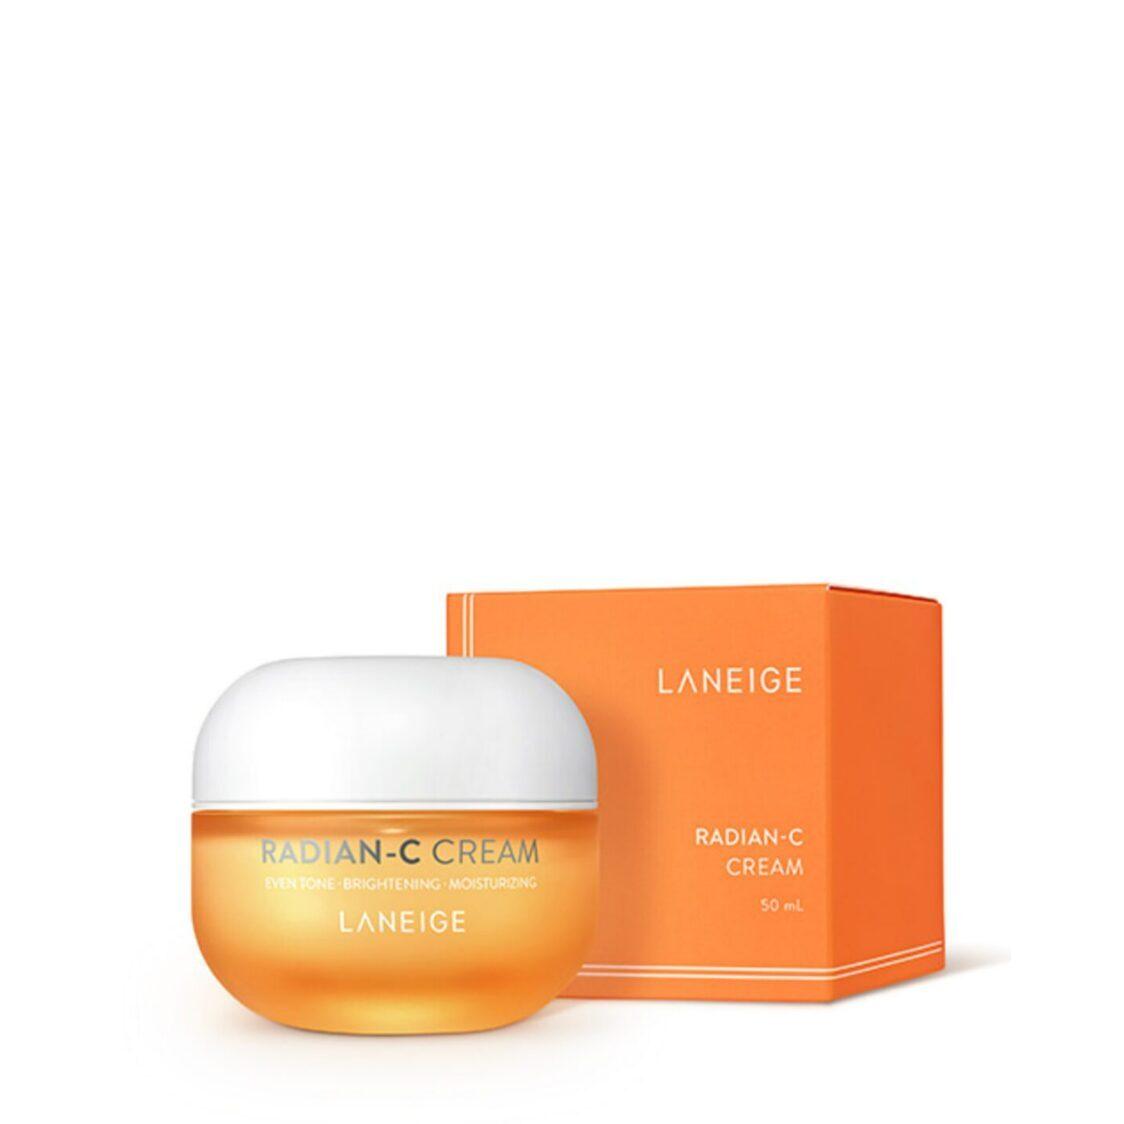 Laneige Radian-C Cream 50ml Set Worth 136